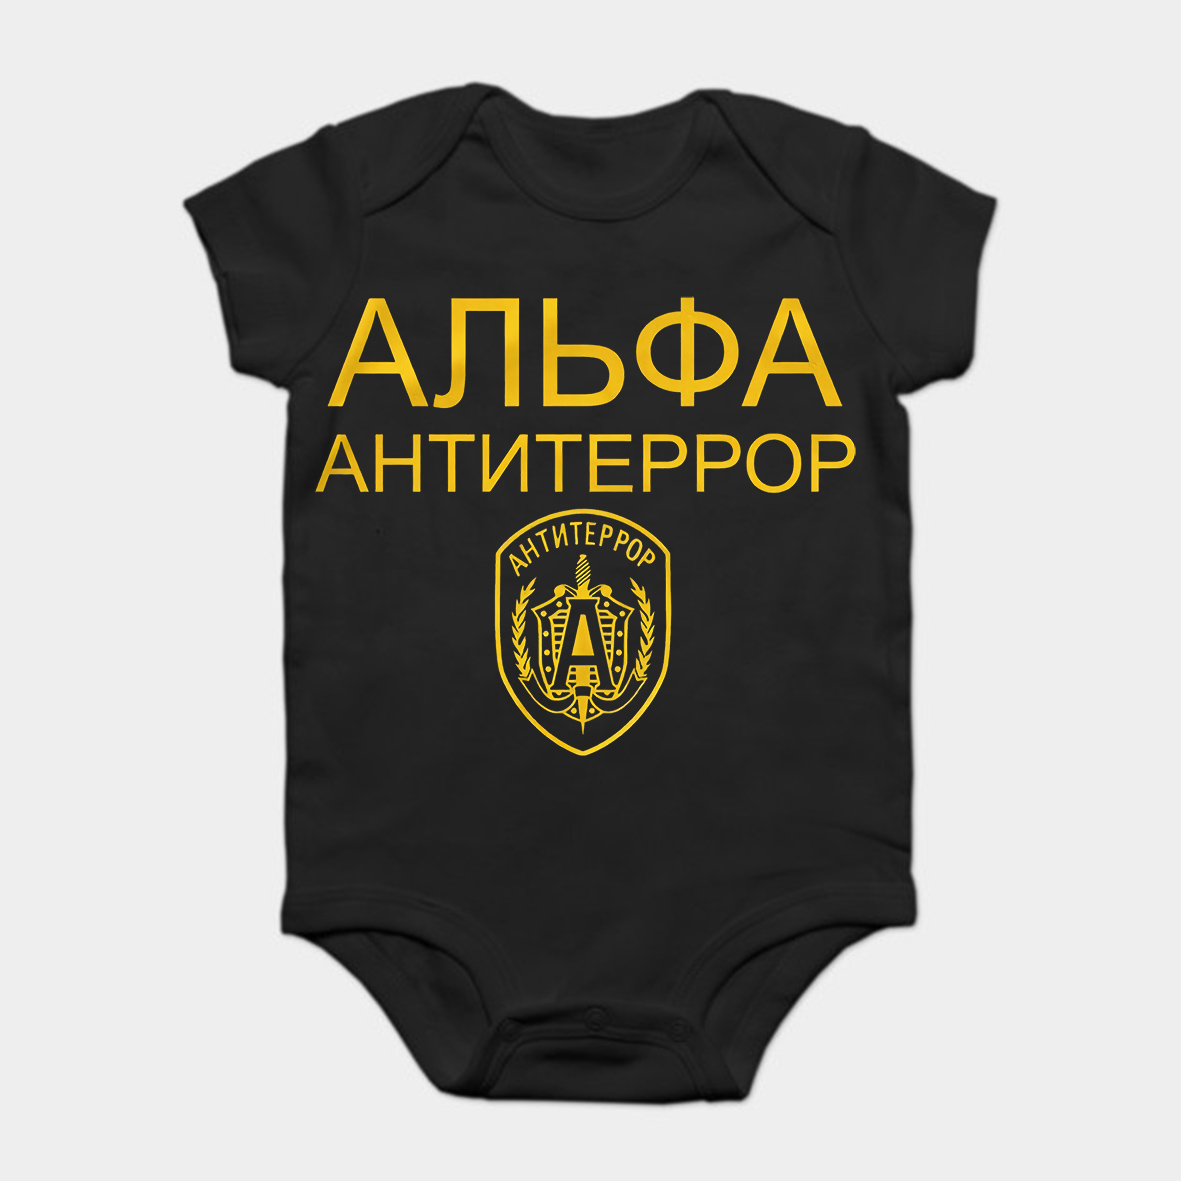 Russlandmoskauudssrputinfsb Gru Movie Shirt Special Summer Sale gold Logical Baby Onesie Baby Bodysuits Kid T Shirt R Cartoon Spetsnas Alpha Antiterror